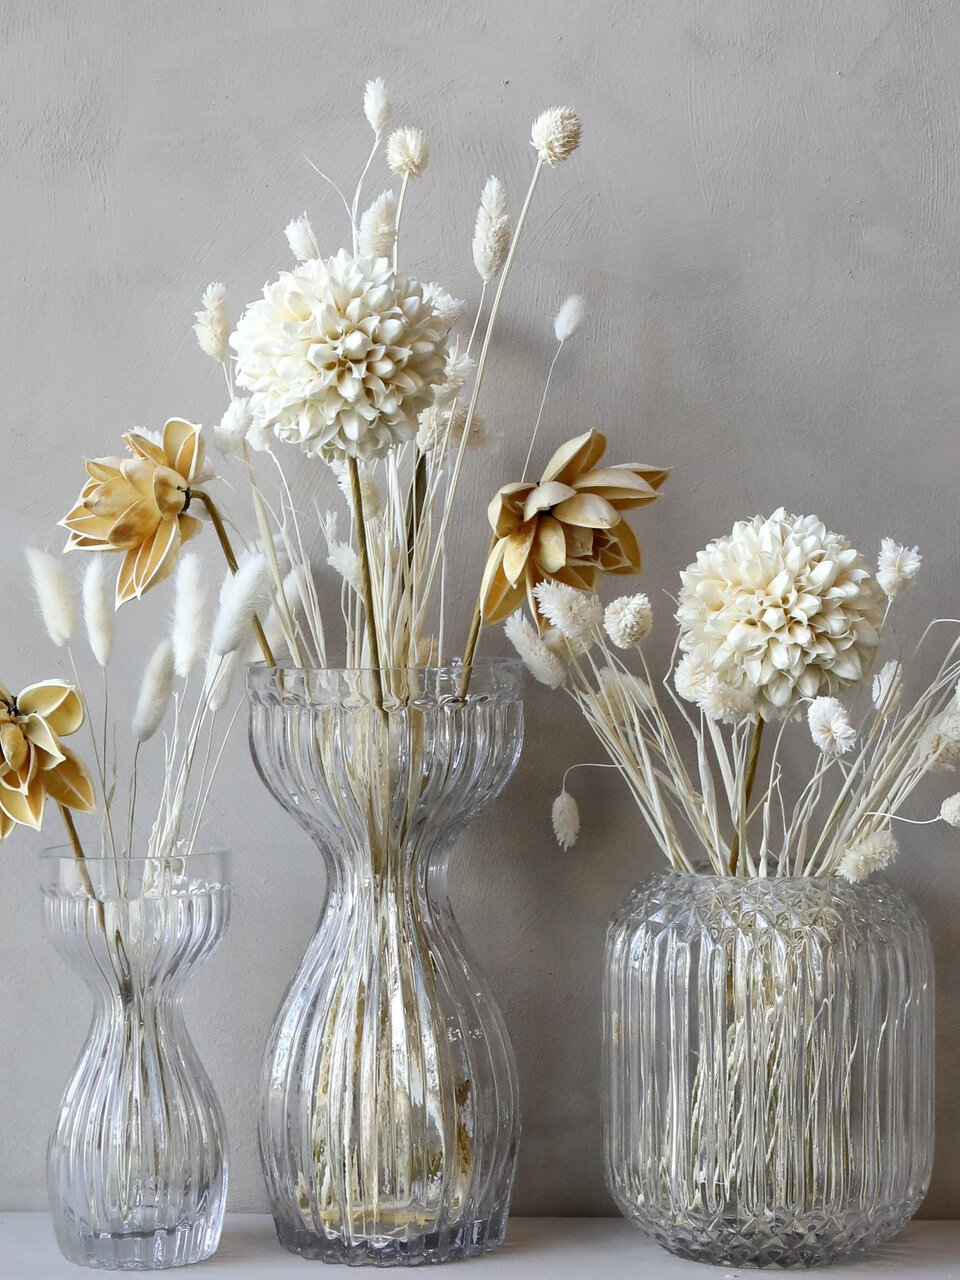 Glas trifft Trockenblume